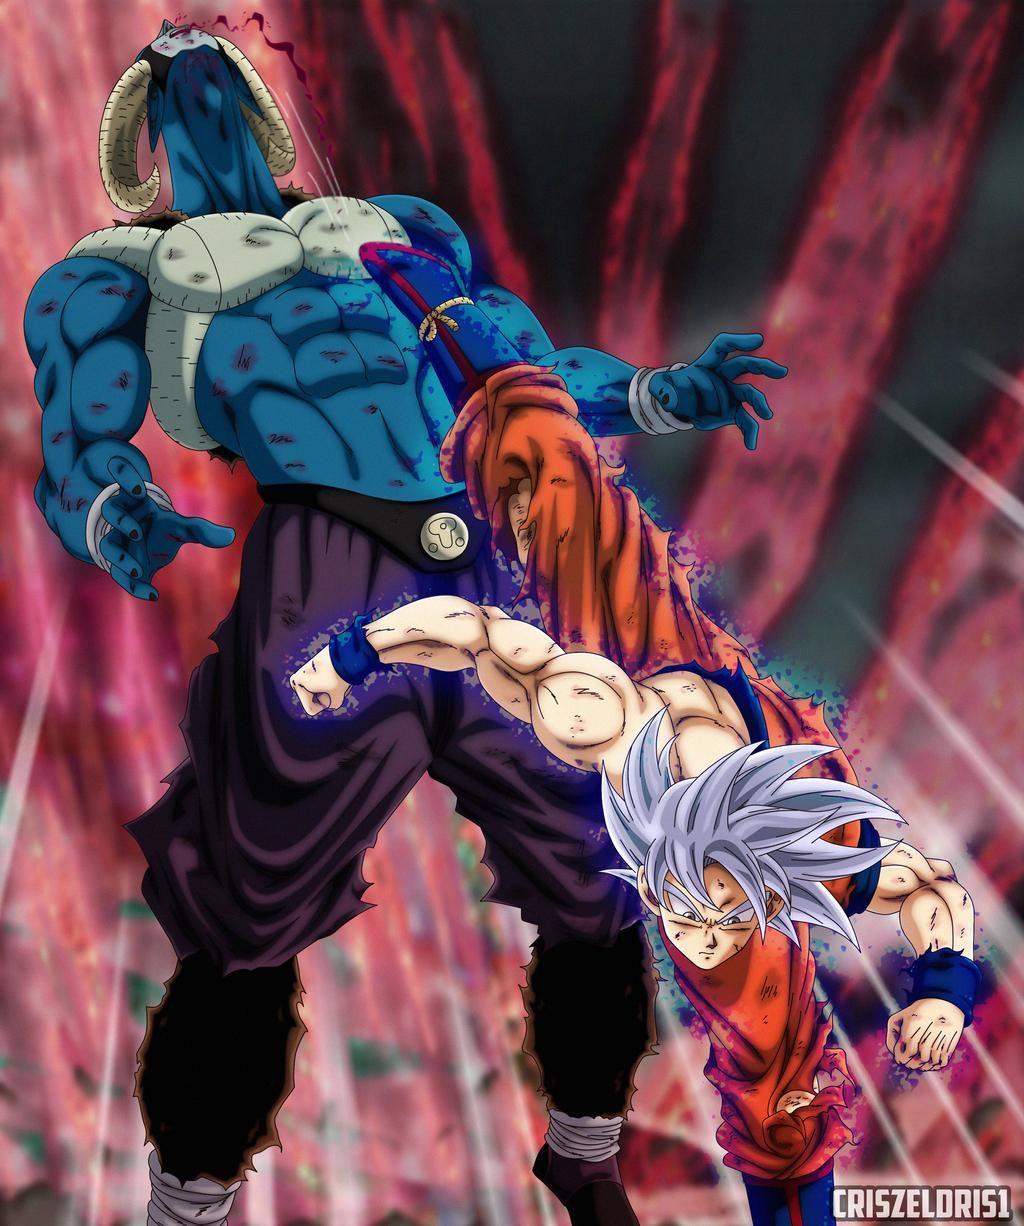 Goku Humiliates Moro Dbs Manga By Criszeldris1 On Deviantart Anime Dragon Ball Super Dragon Ball Super Goku Dragon Ball Super Manga